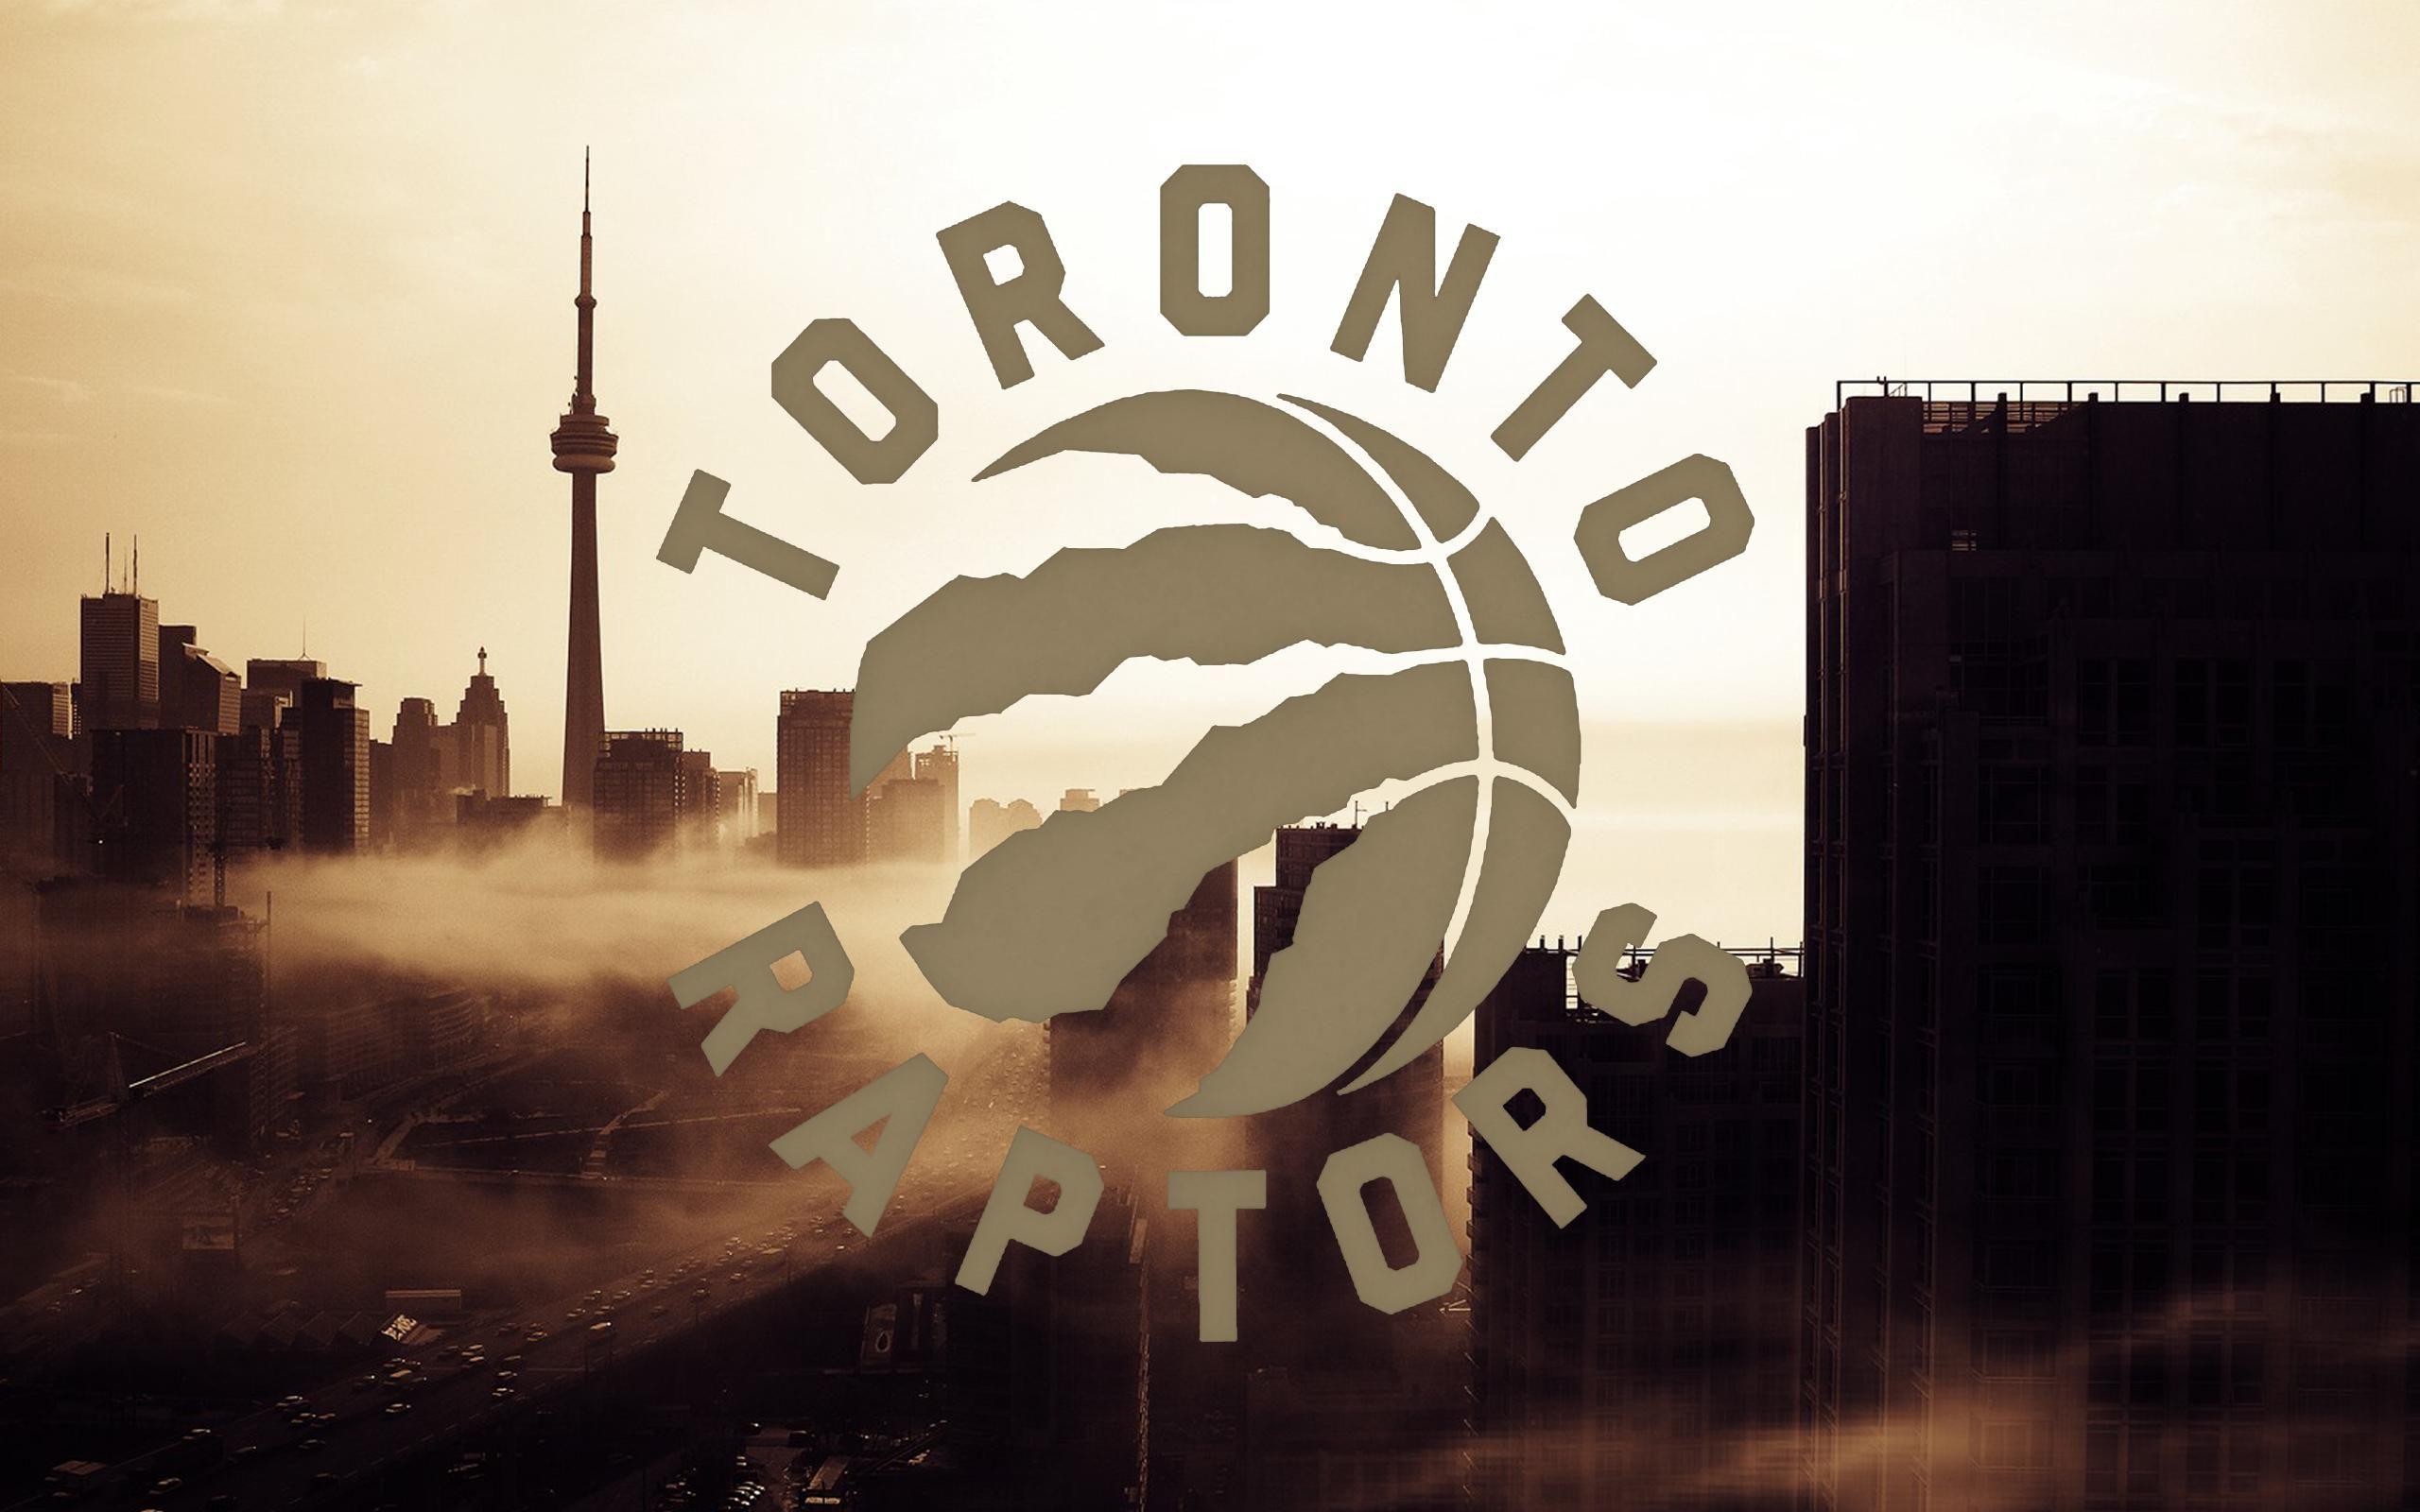 Cool Wallpaper Logo Toronto Raptor - c065f14f060304139317adcf06023496  Graphic_431428.jpg